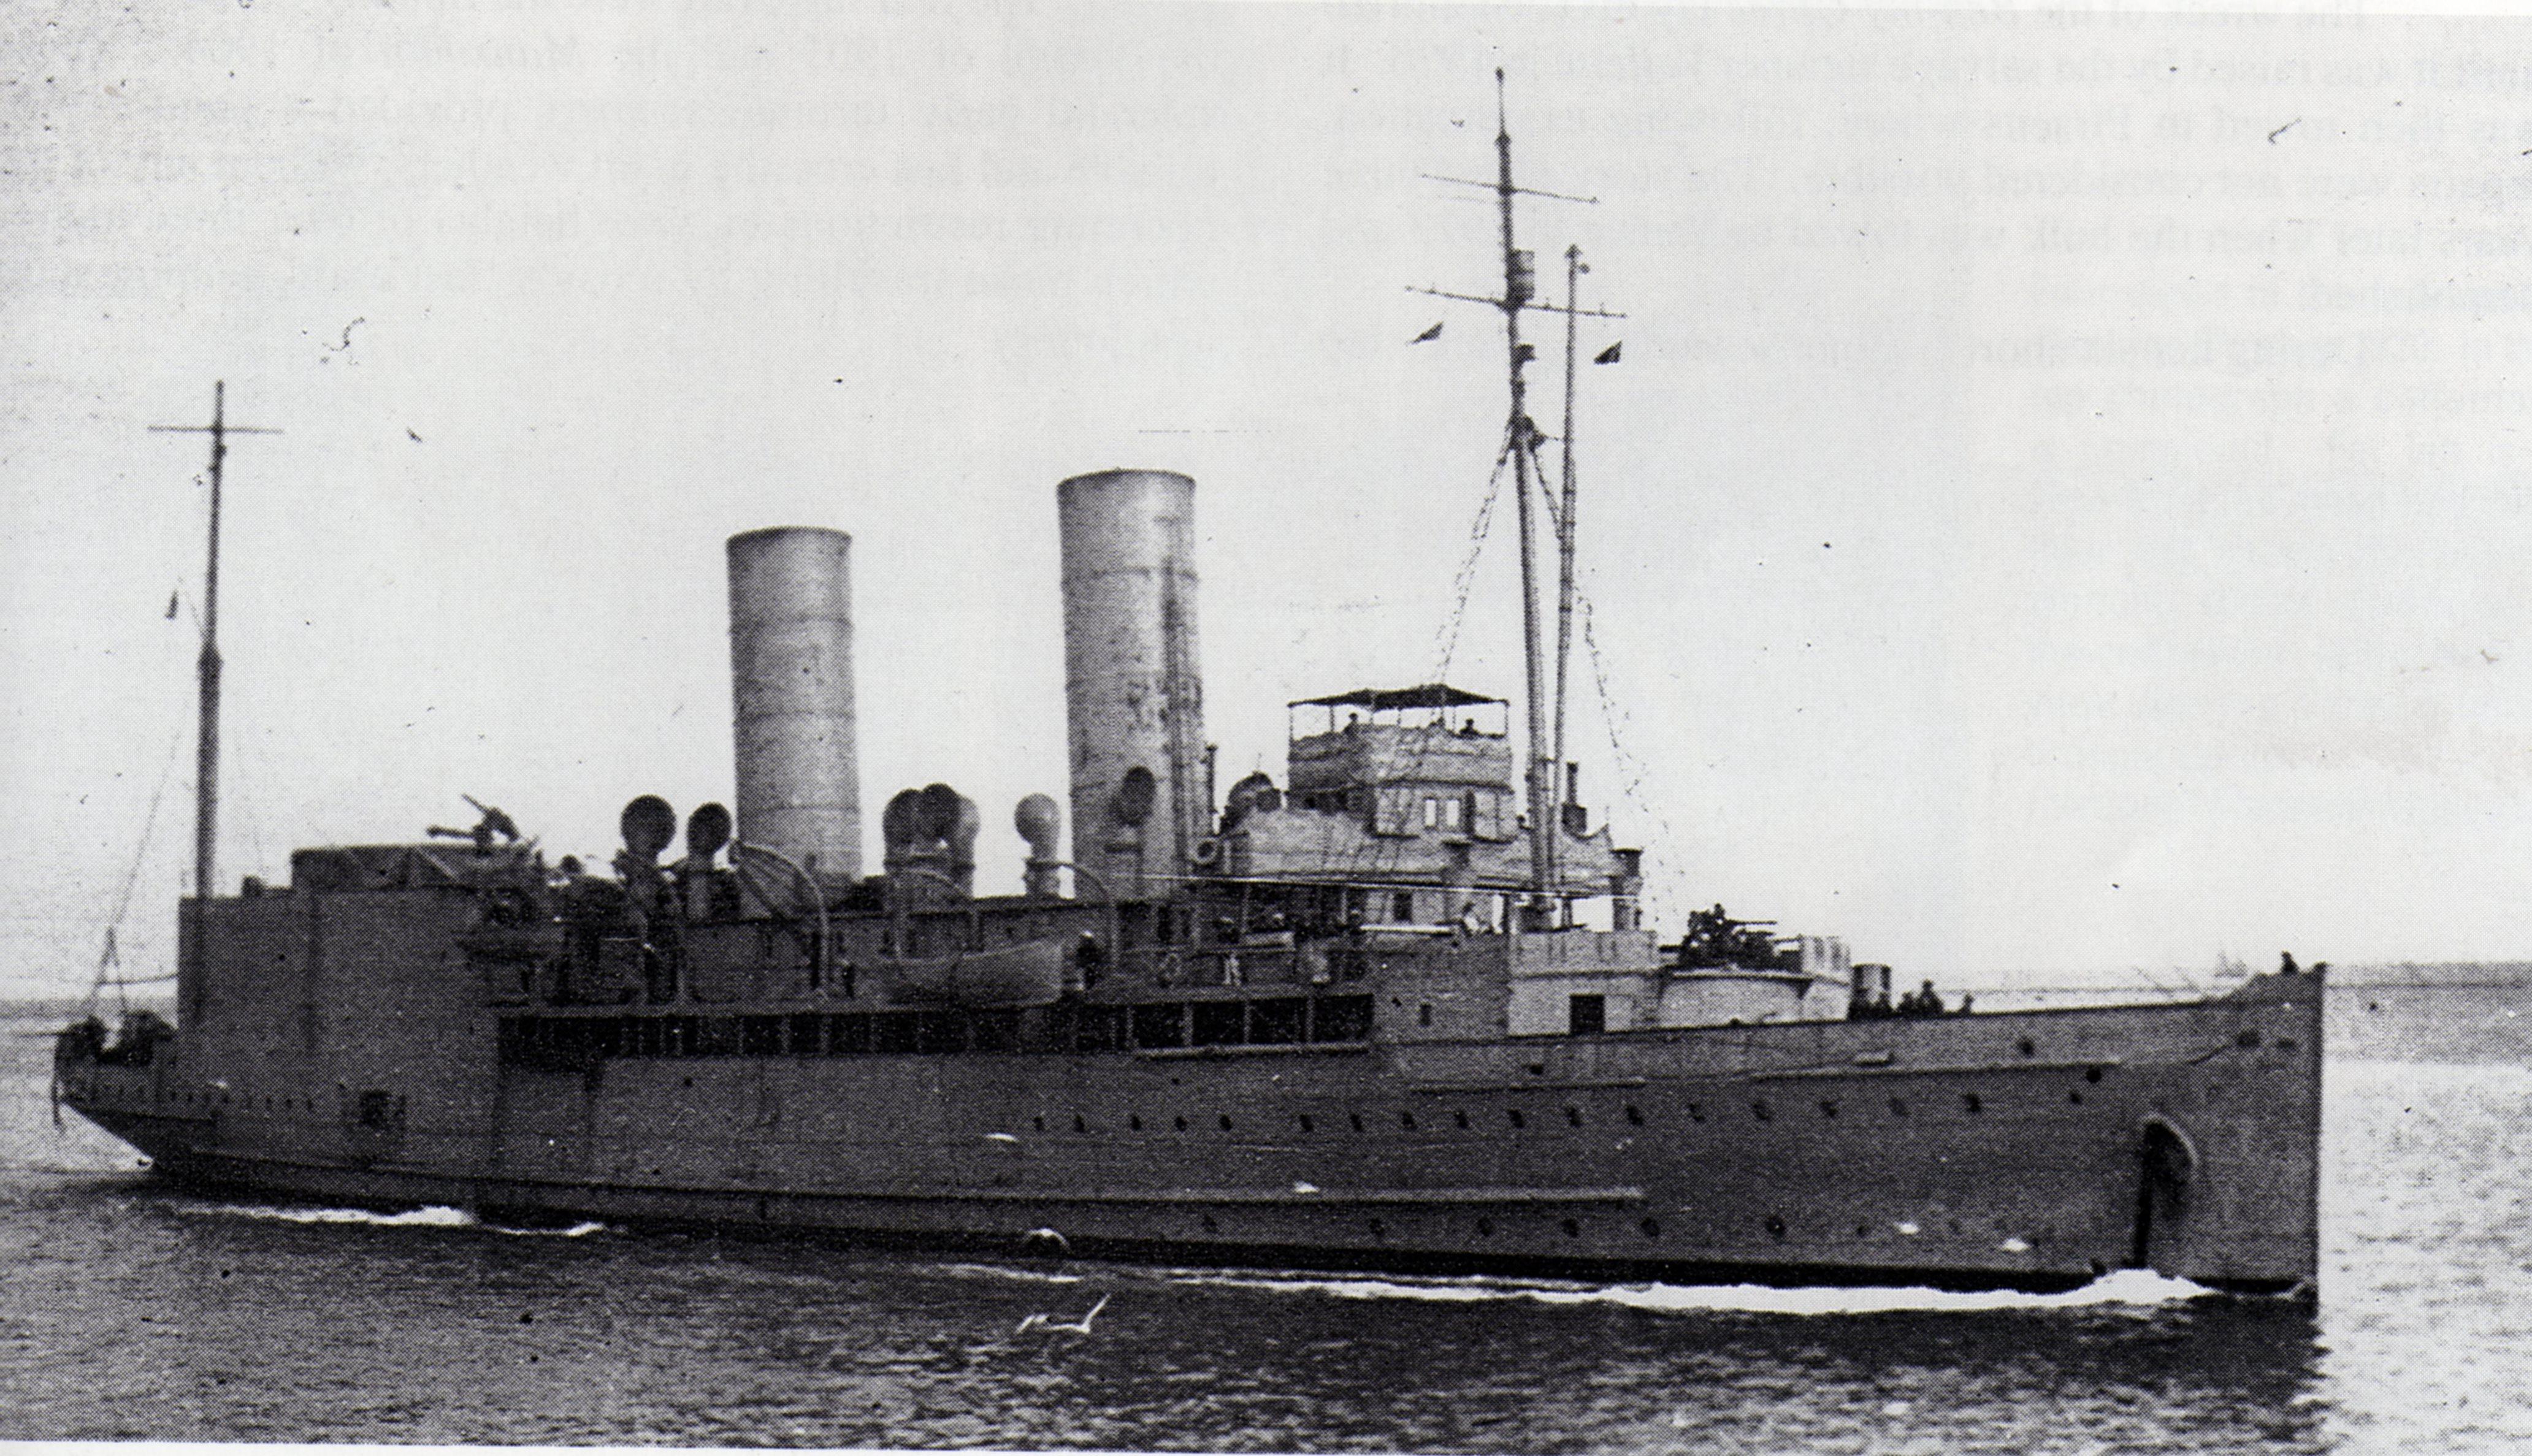 hms_ben-my-chree_1915